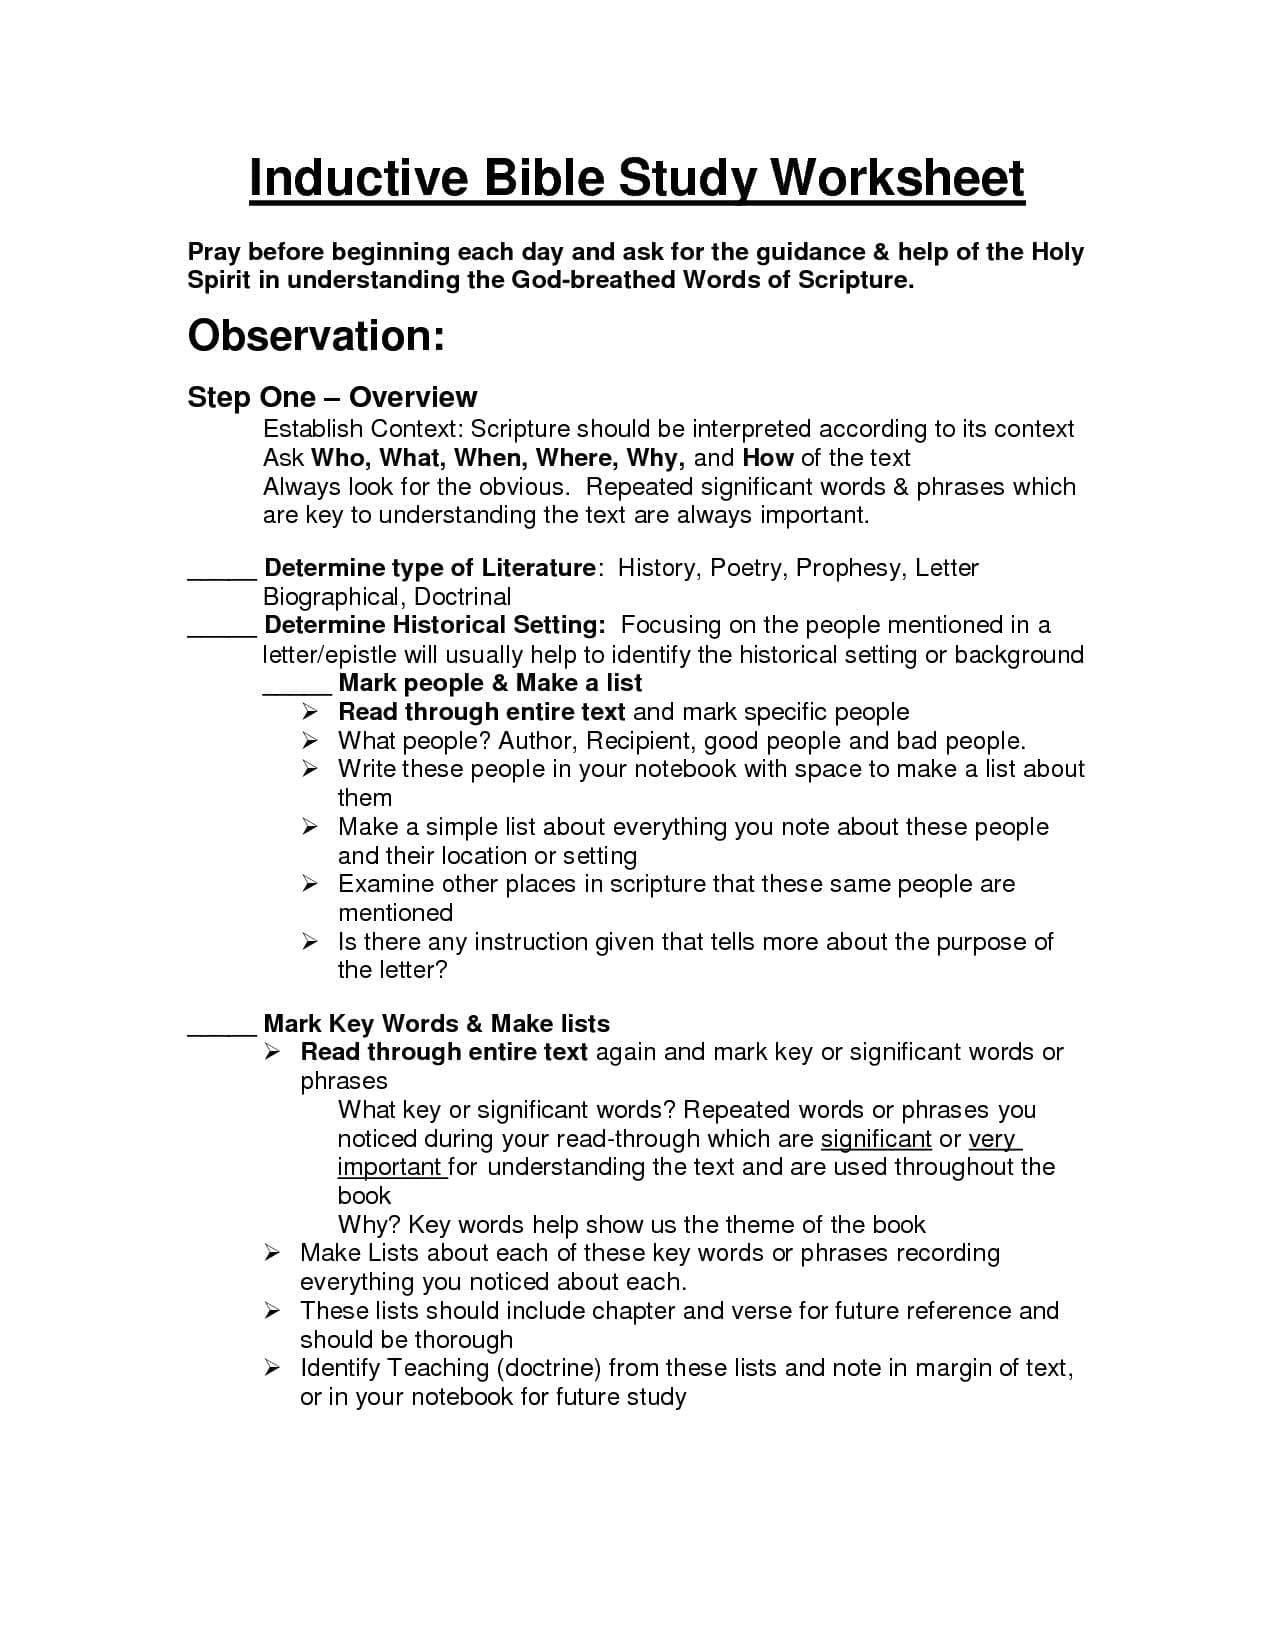 Worksheets Inductive Bible Study Worksheet inductive bible study worksheet photos leafsea leafsea